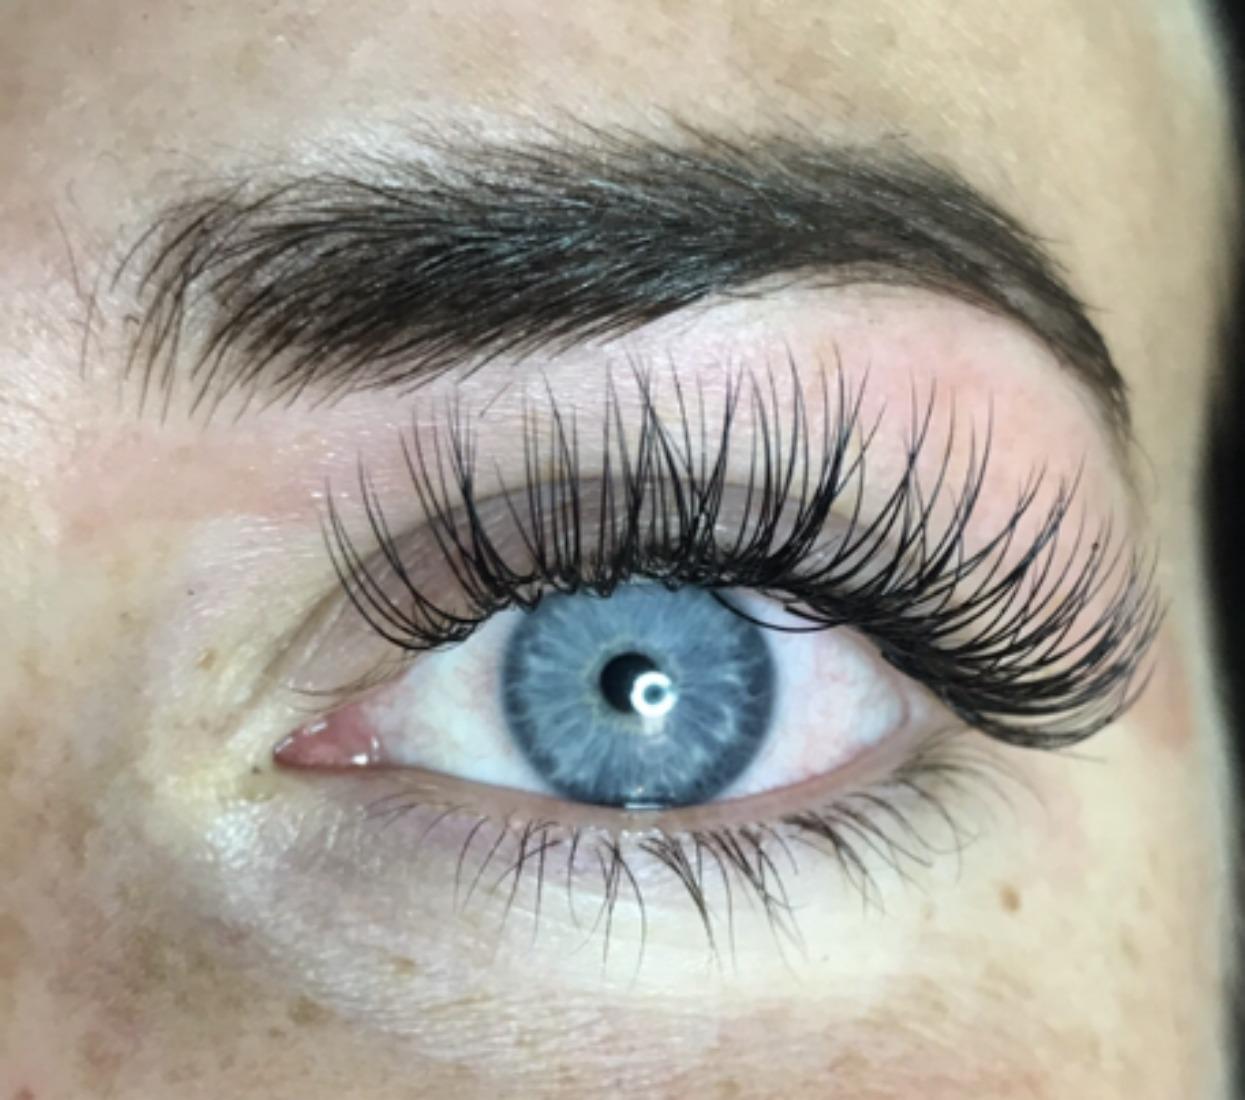 download 3 - Eyelash Extensions & Eyelash Lifts